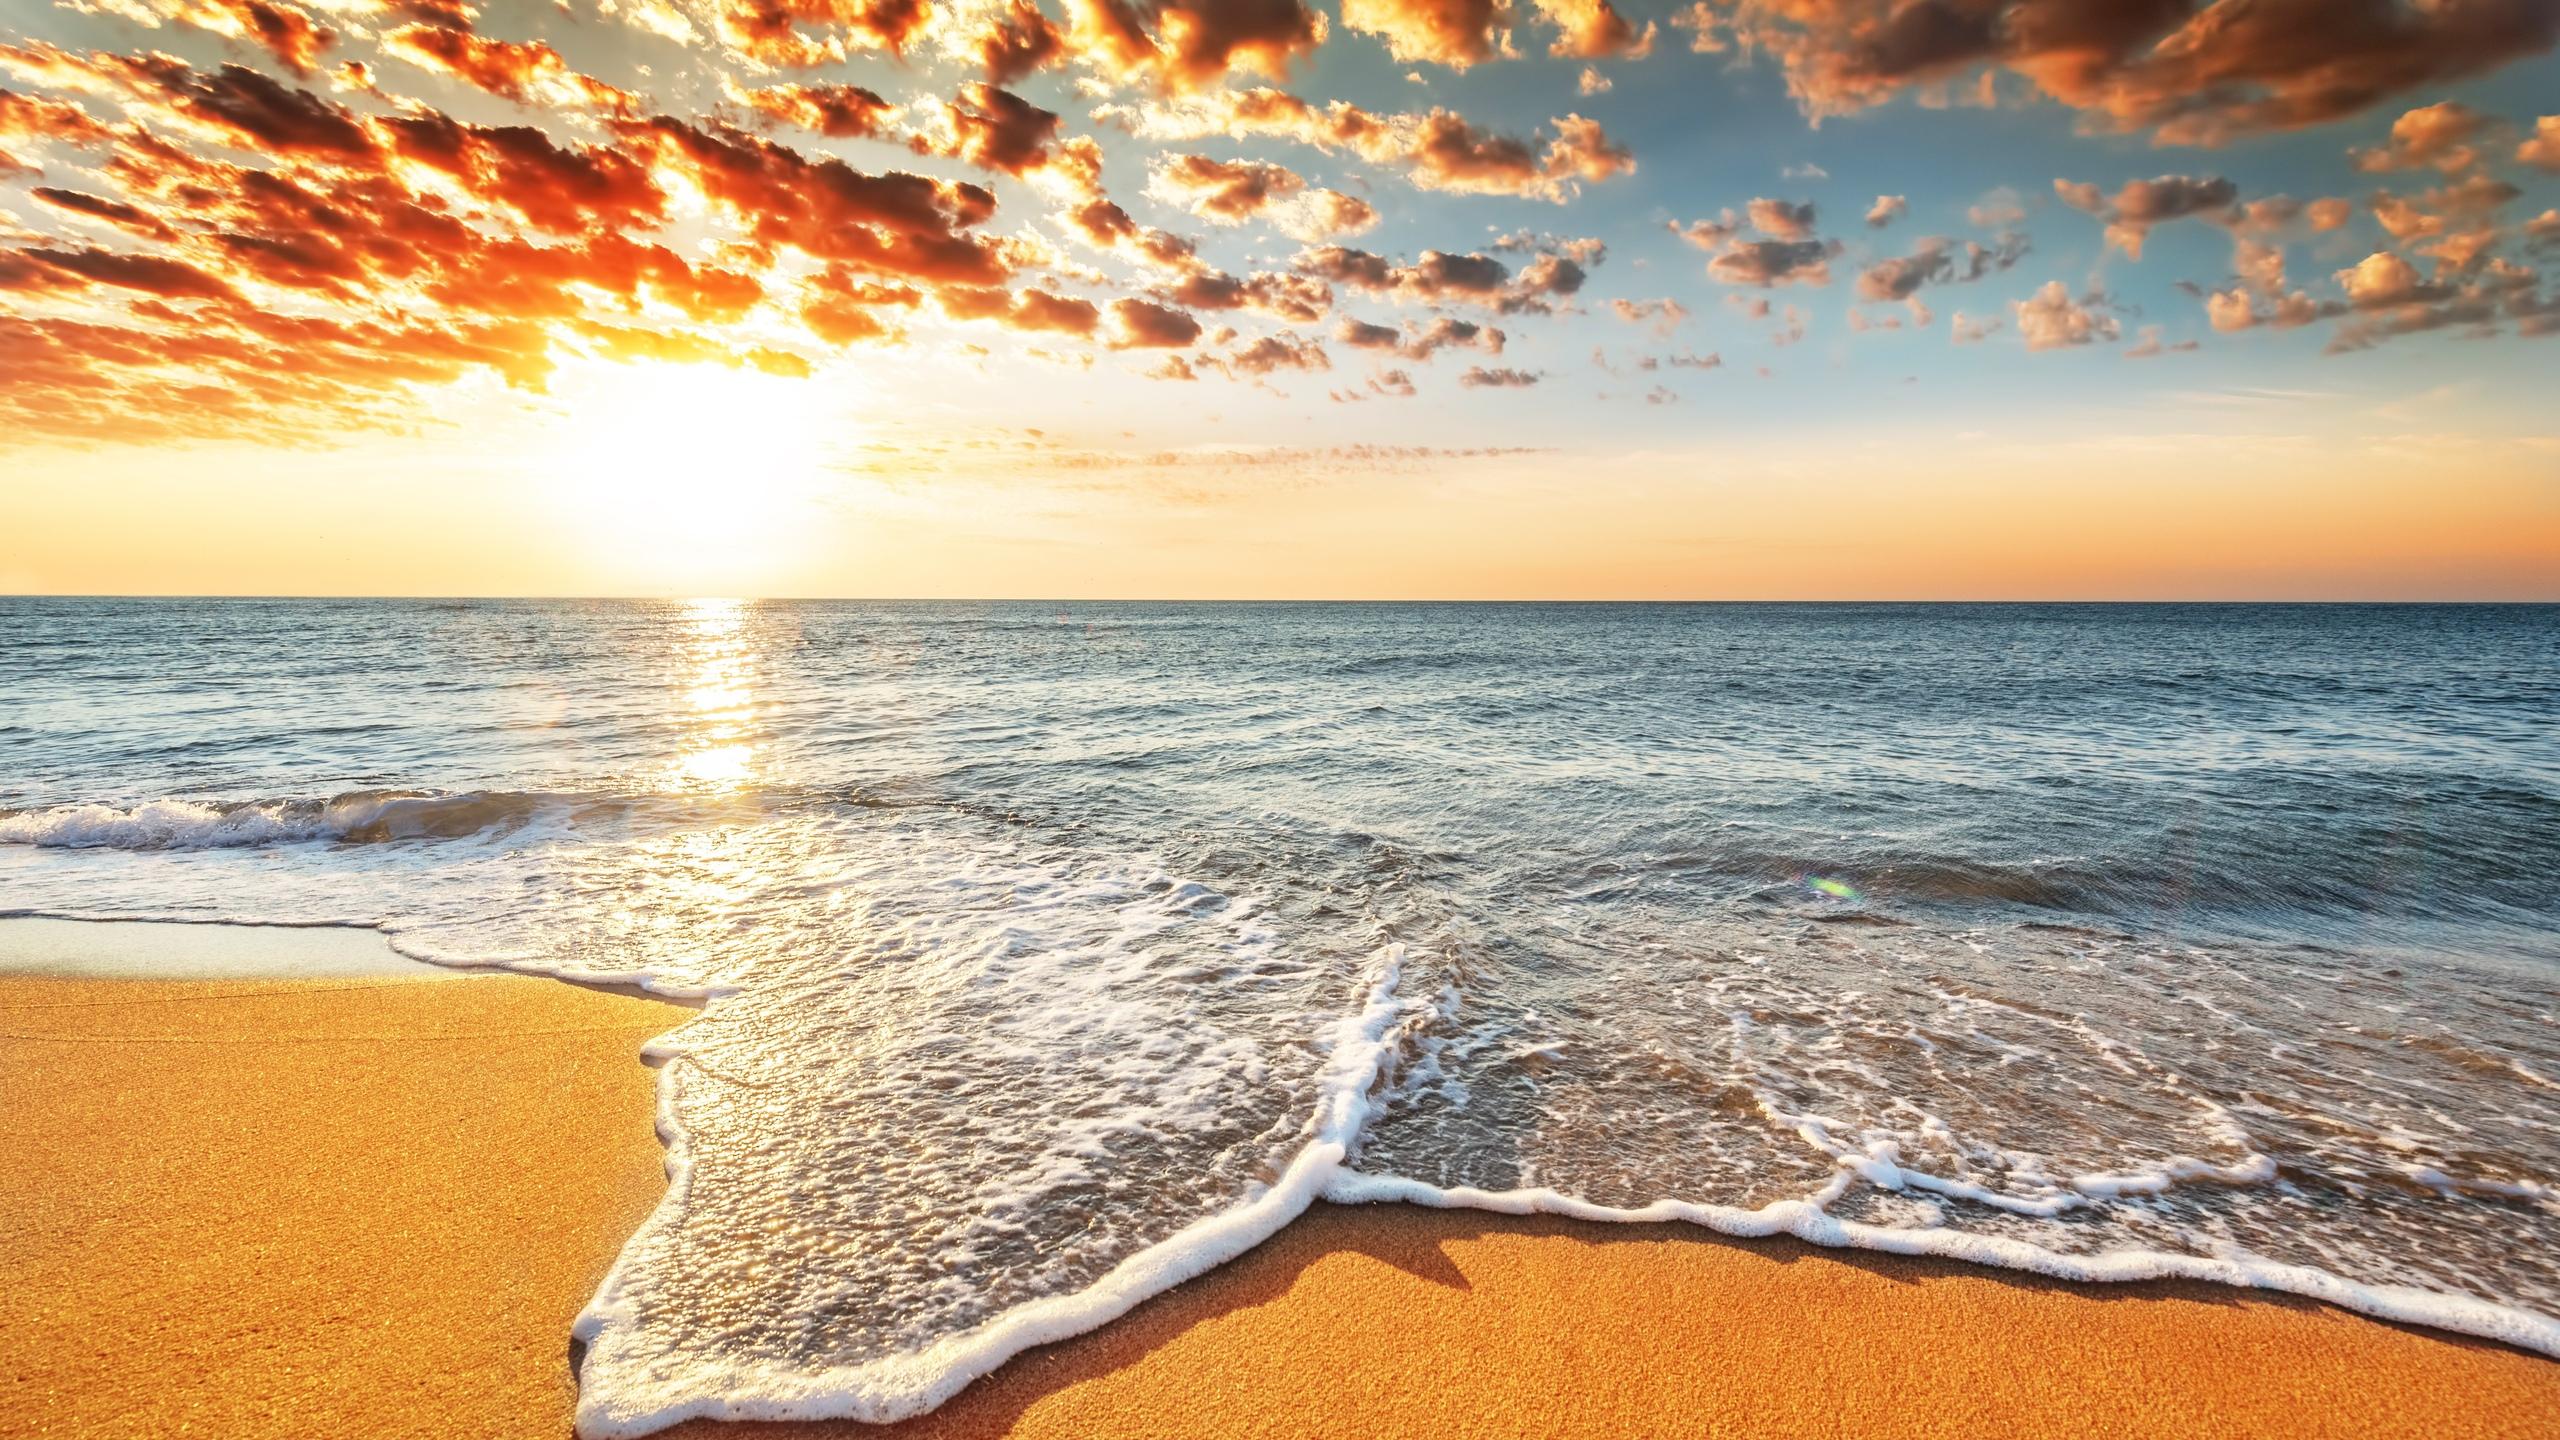 море, солнце, облака